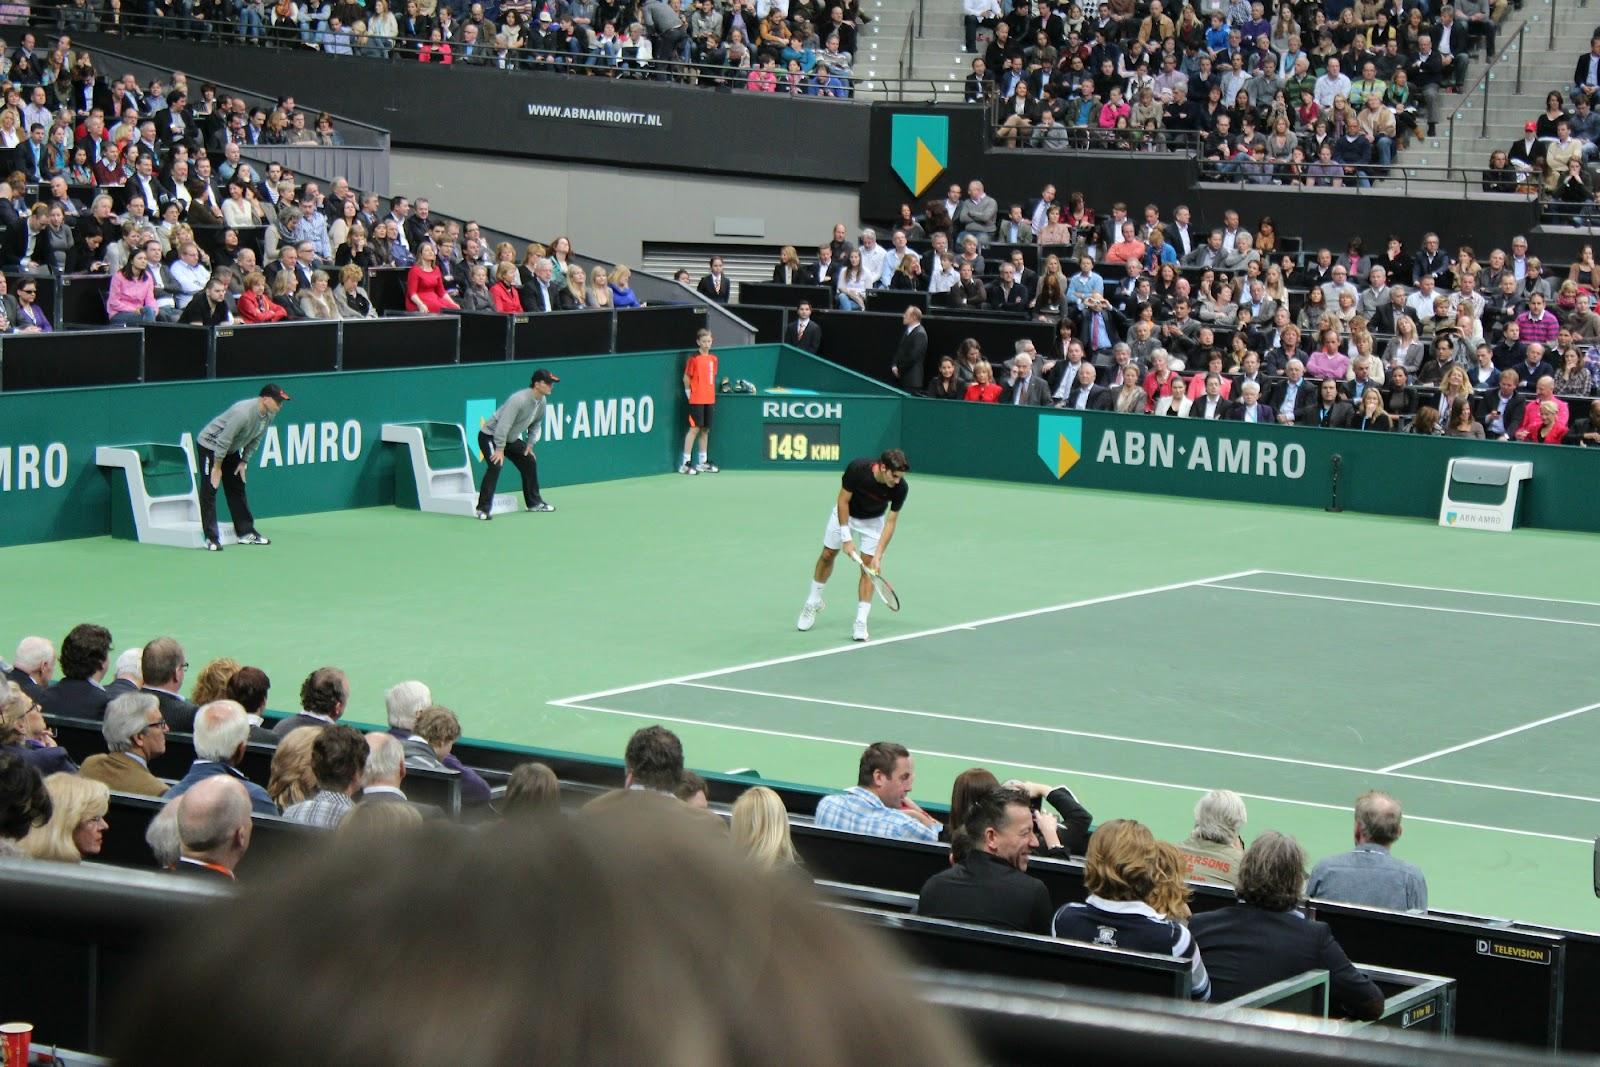 Abn Amro Tennis